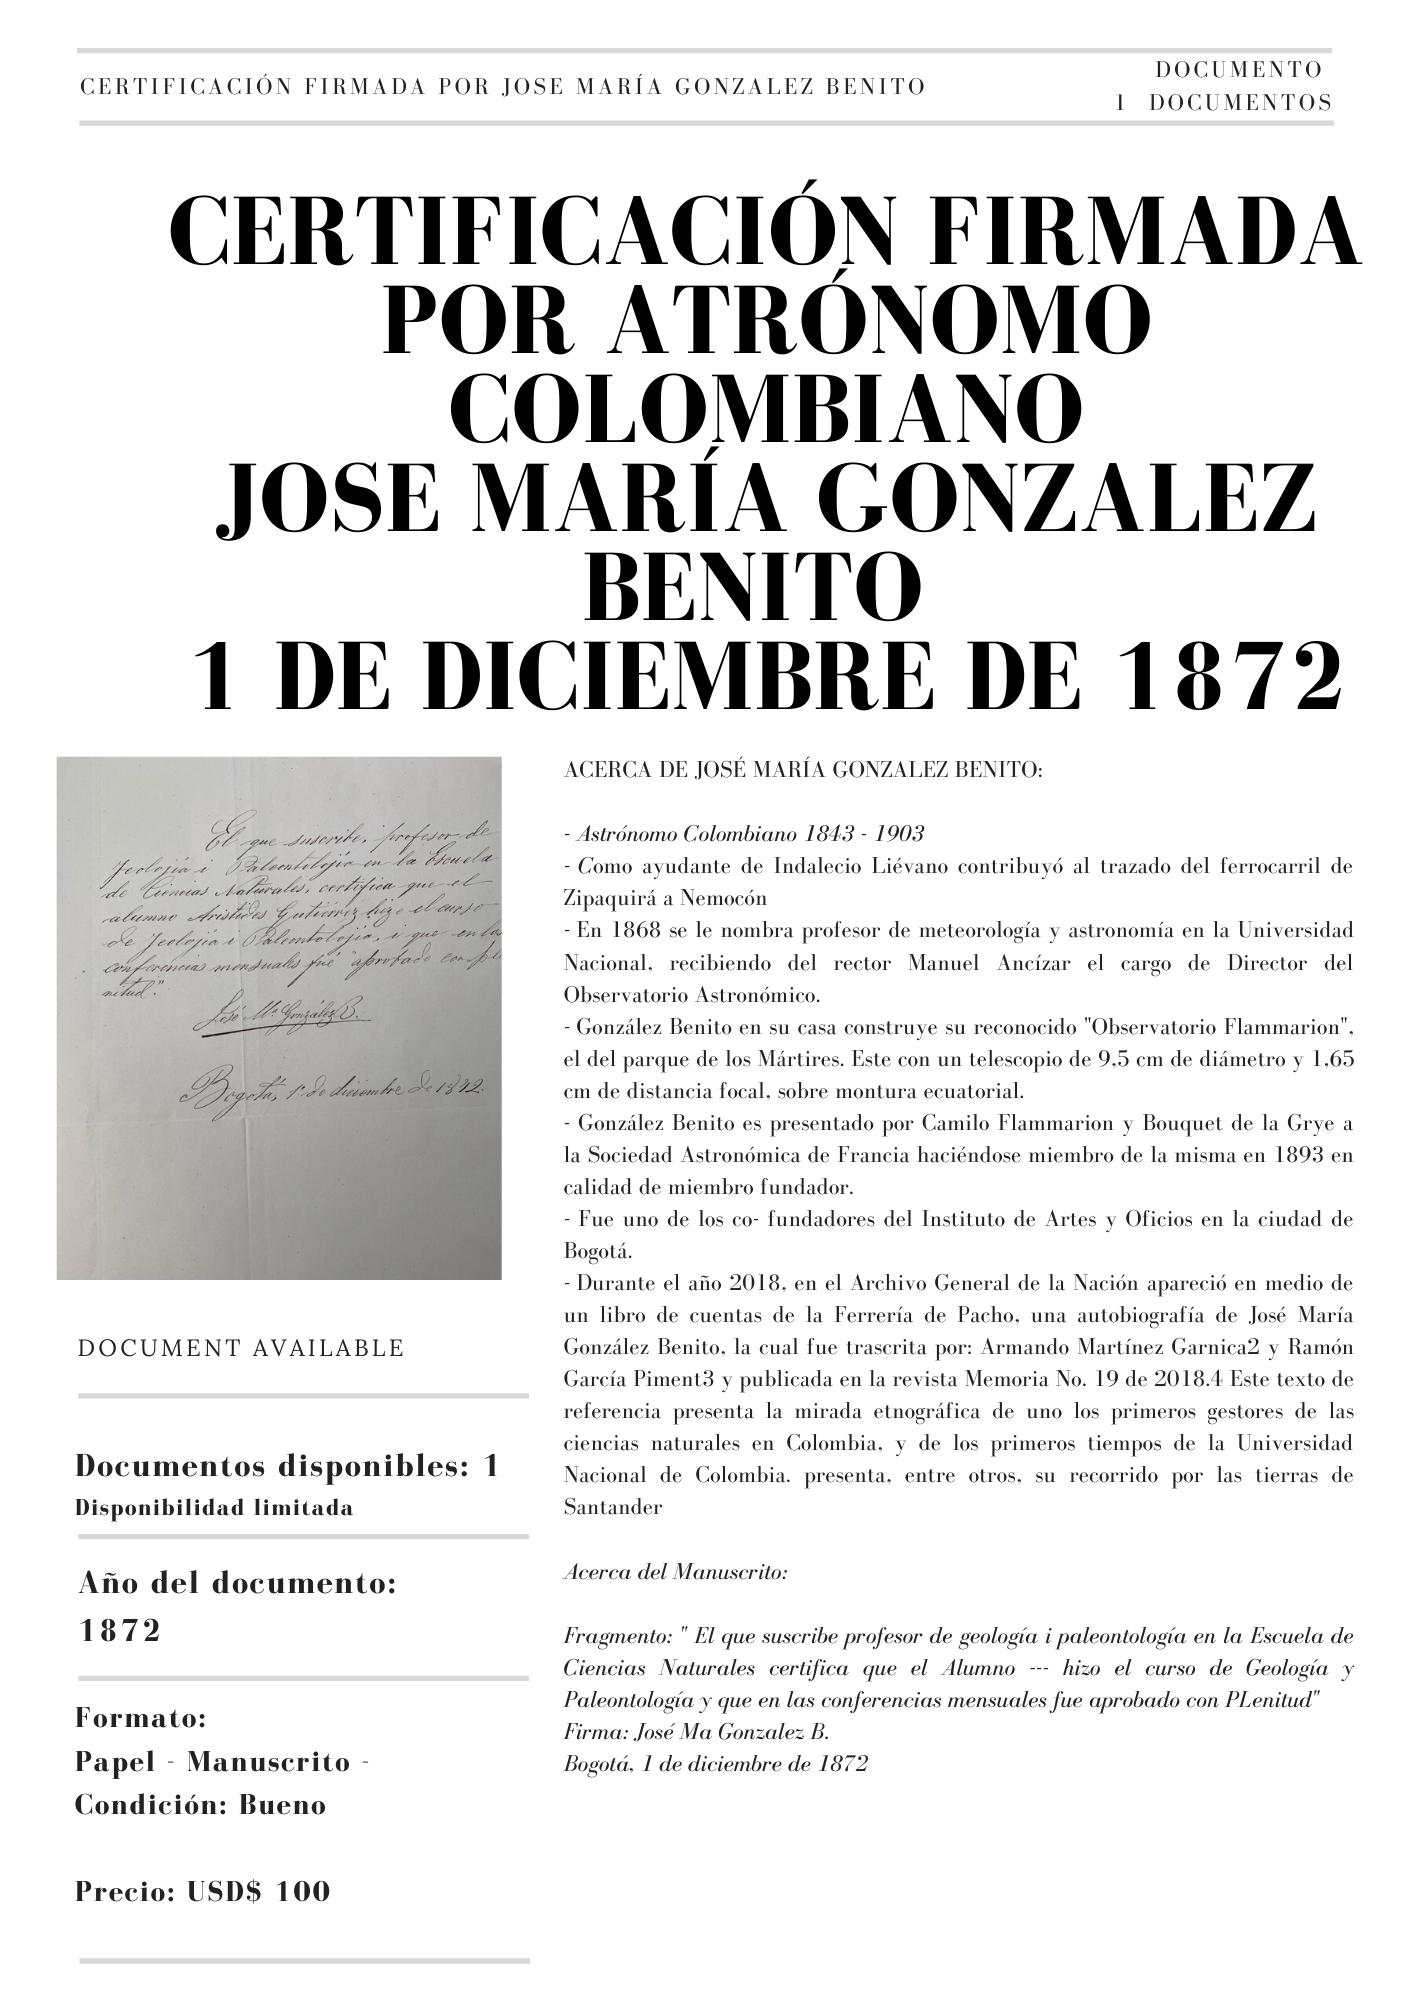 CERTIFI_JOSE_MARÍA_GONZALEZ_BENITO